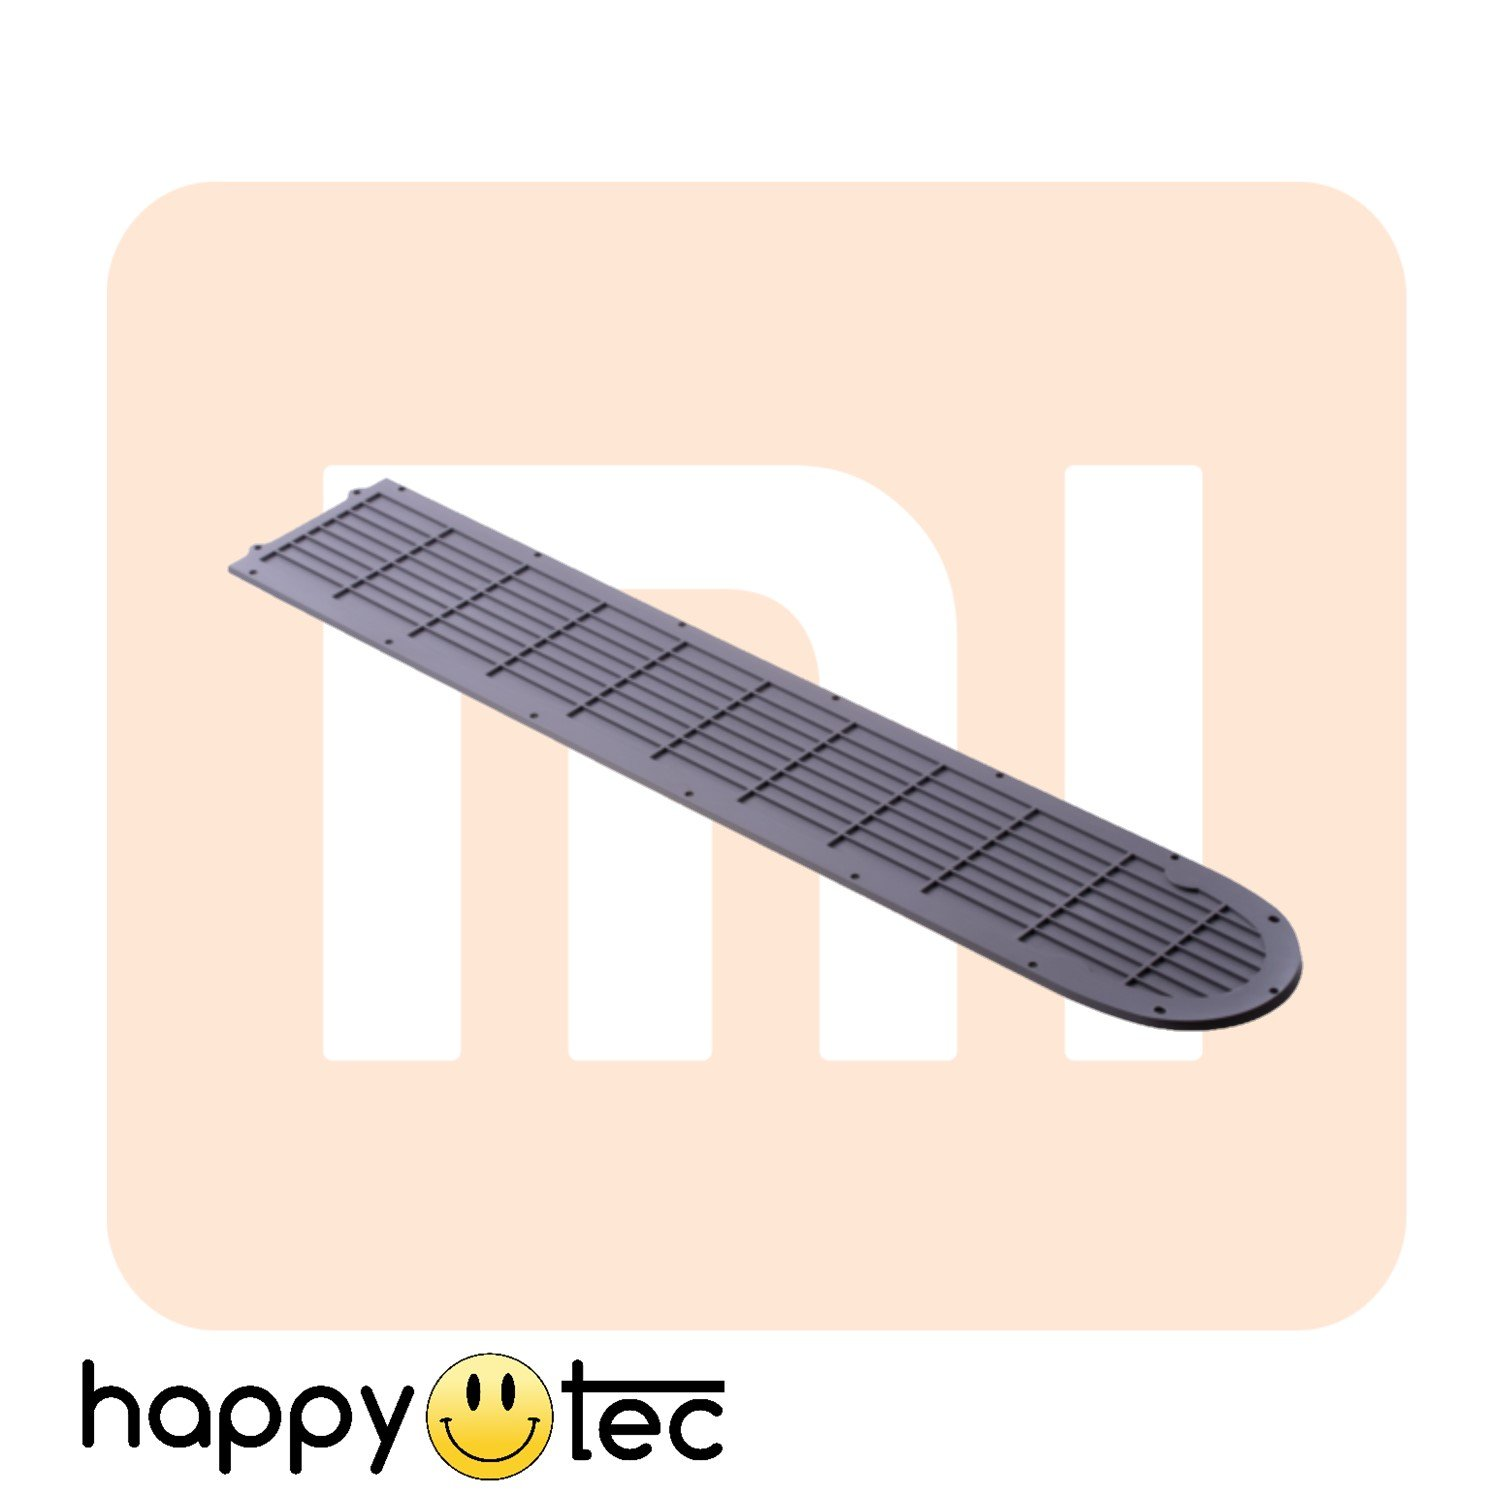 Coperchio vano batteria per Xiaomi M365 / Essential / 1S